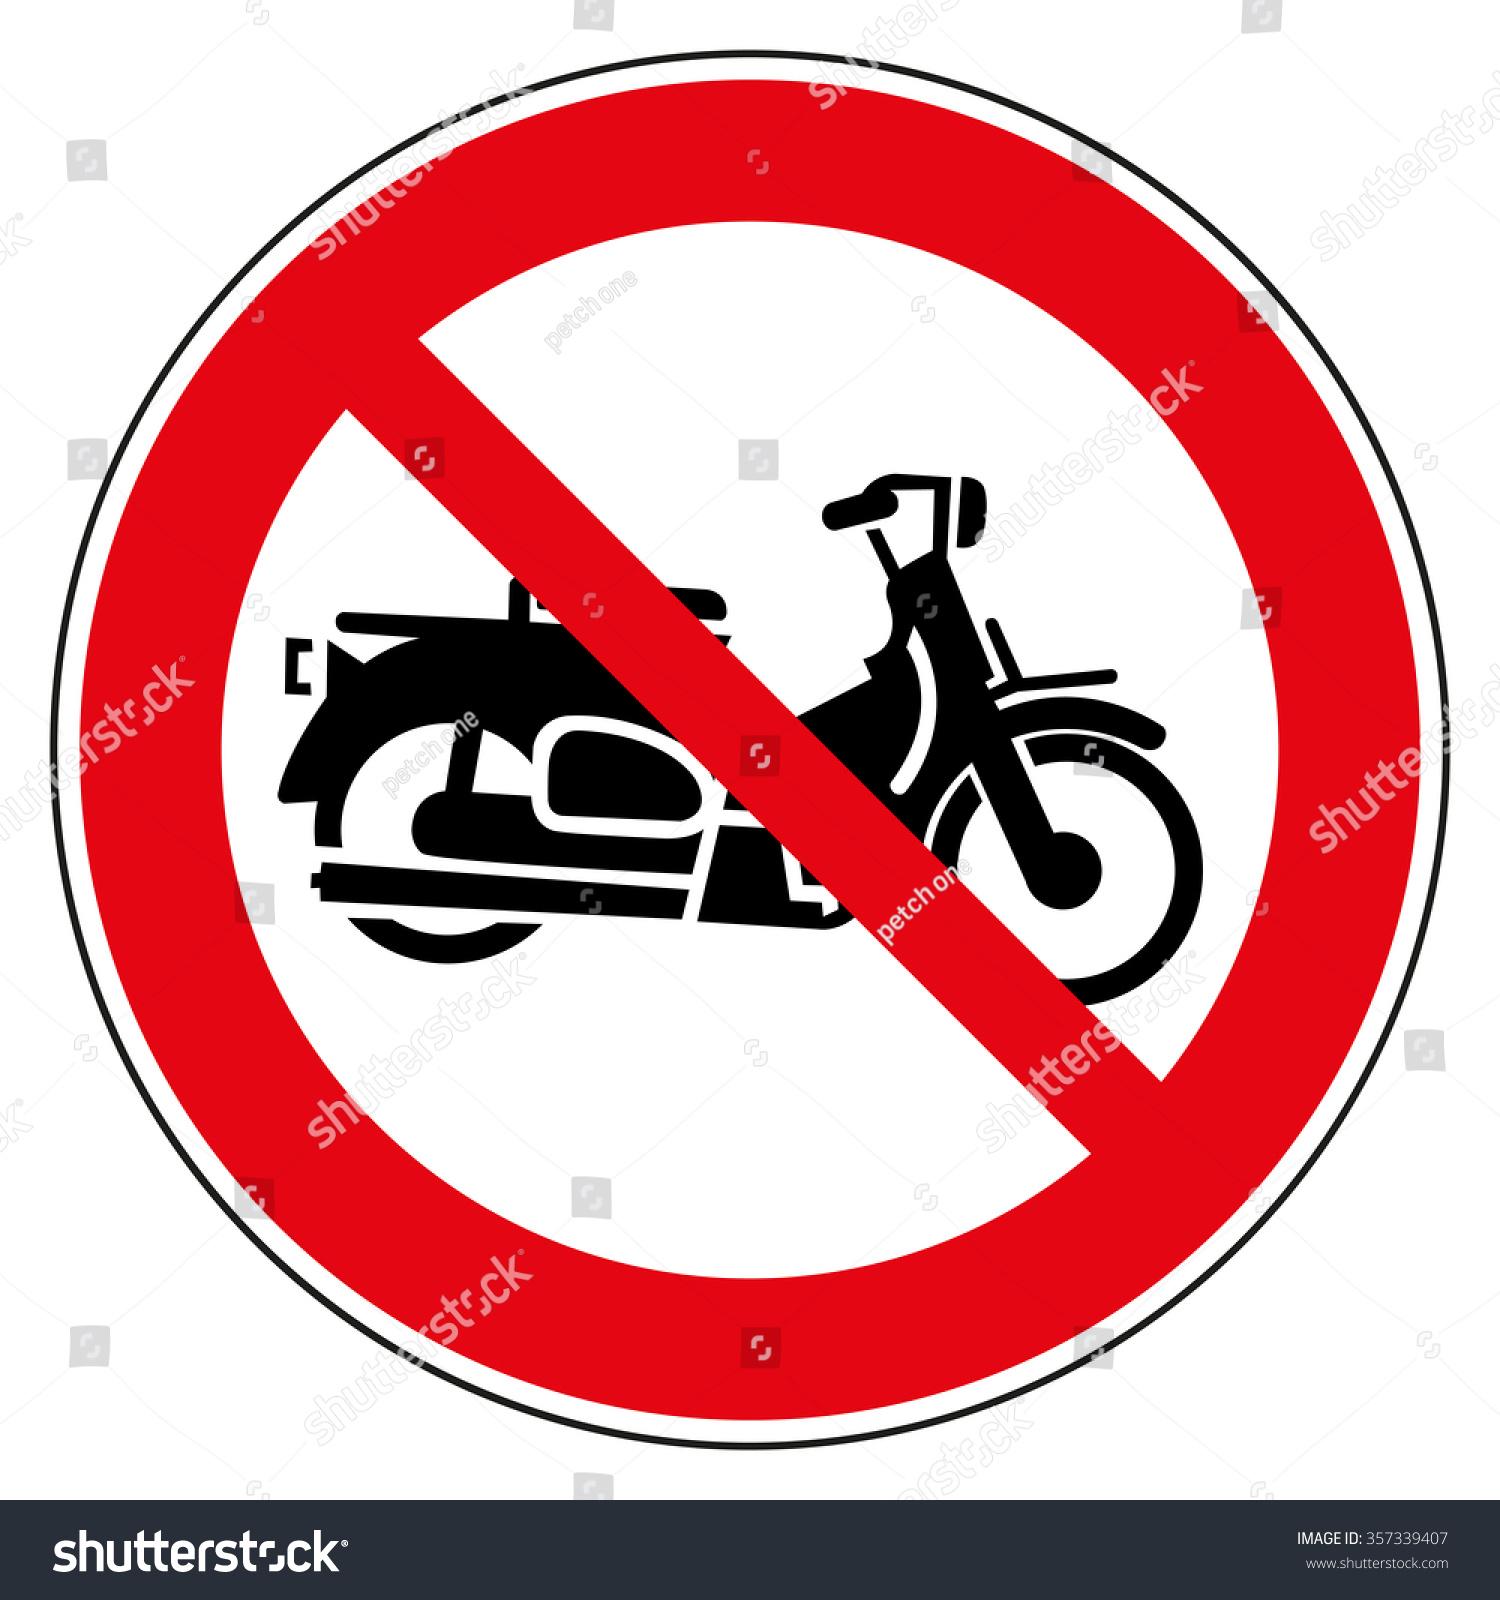 No Motorcycle No Parking Sign Stock Vector 357339407 - Shutterstock